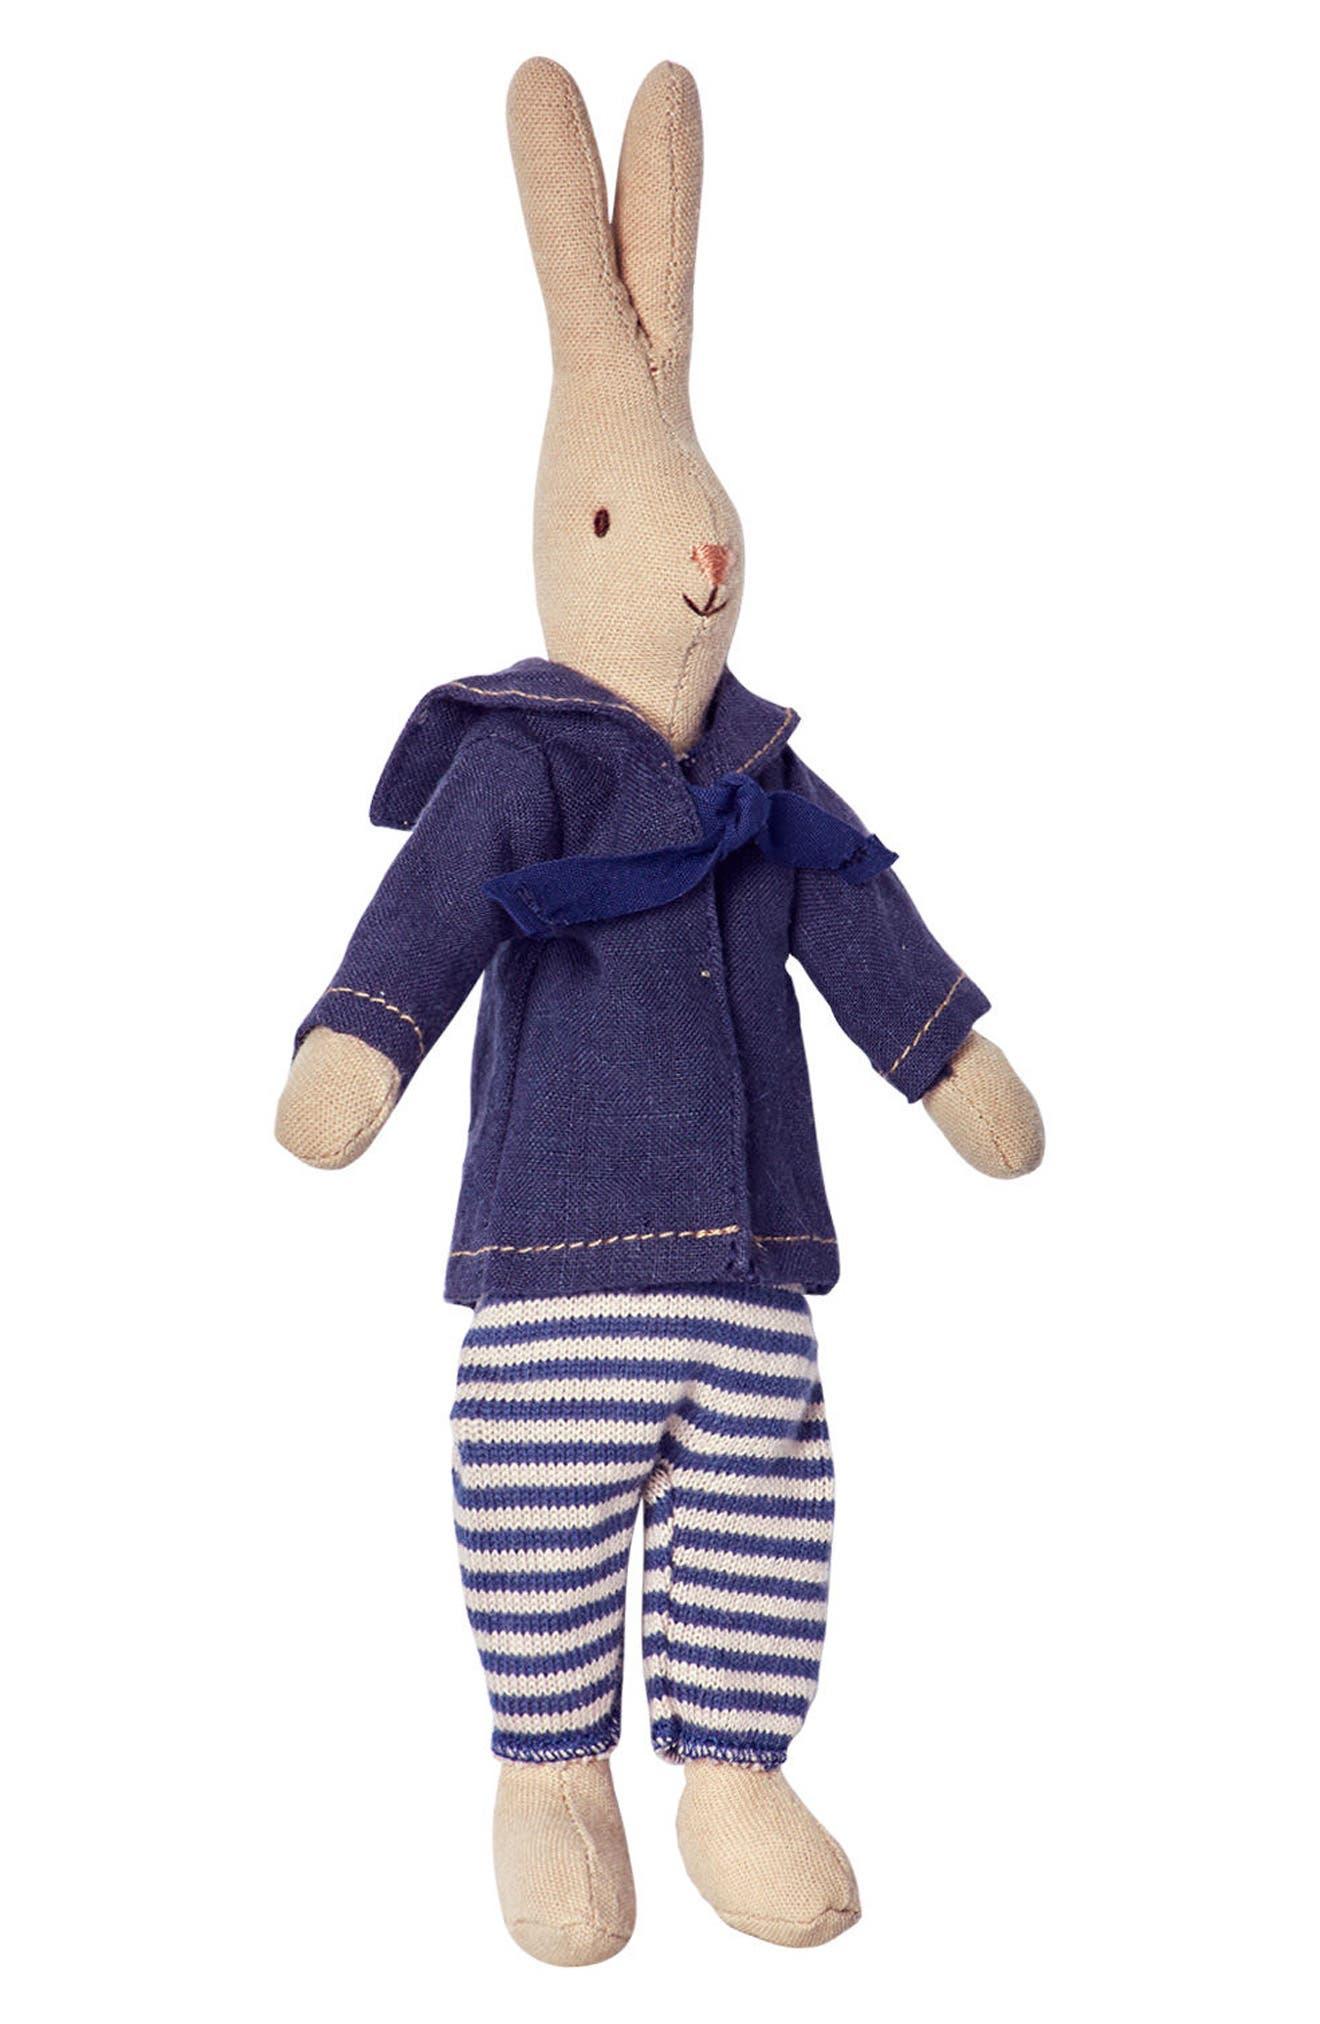 Mini Marcus Rabbit Stuffed Animal,                             Main thumbnail 1, color,                             Blue